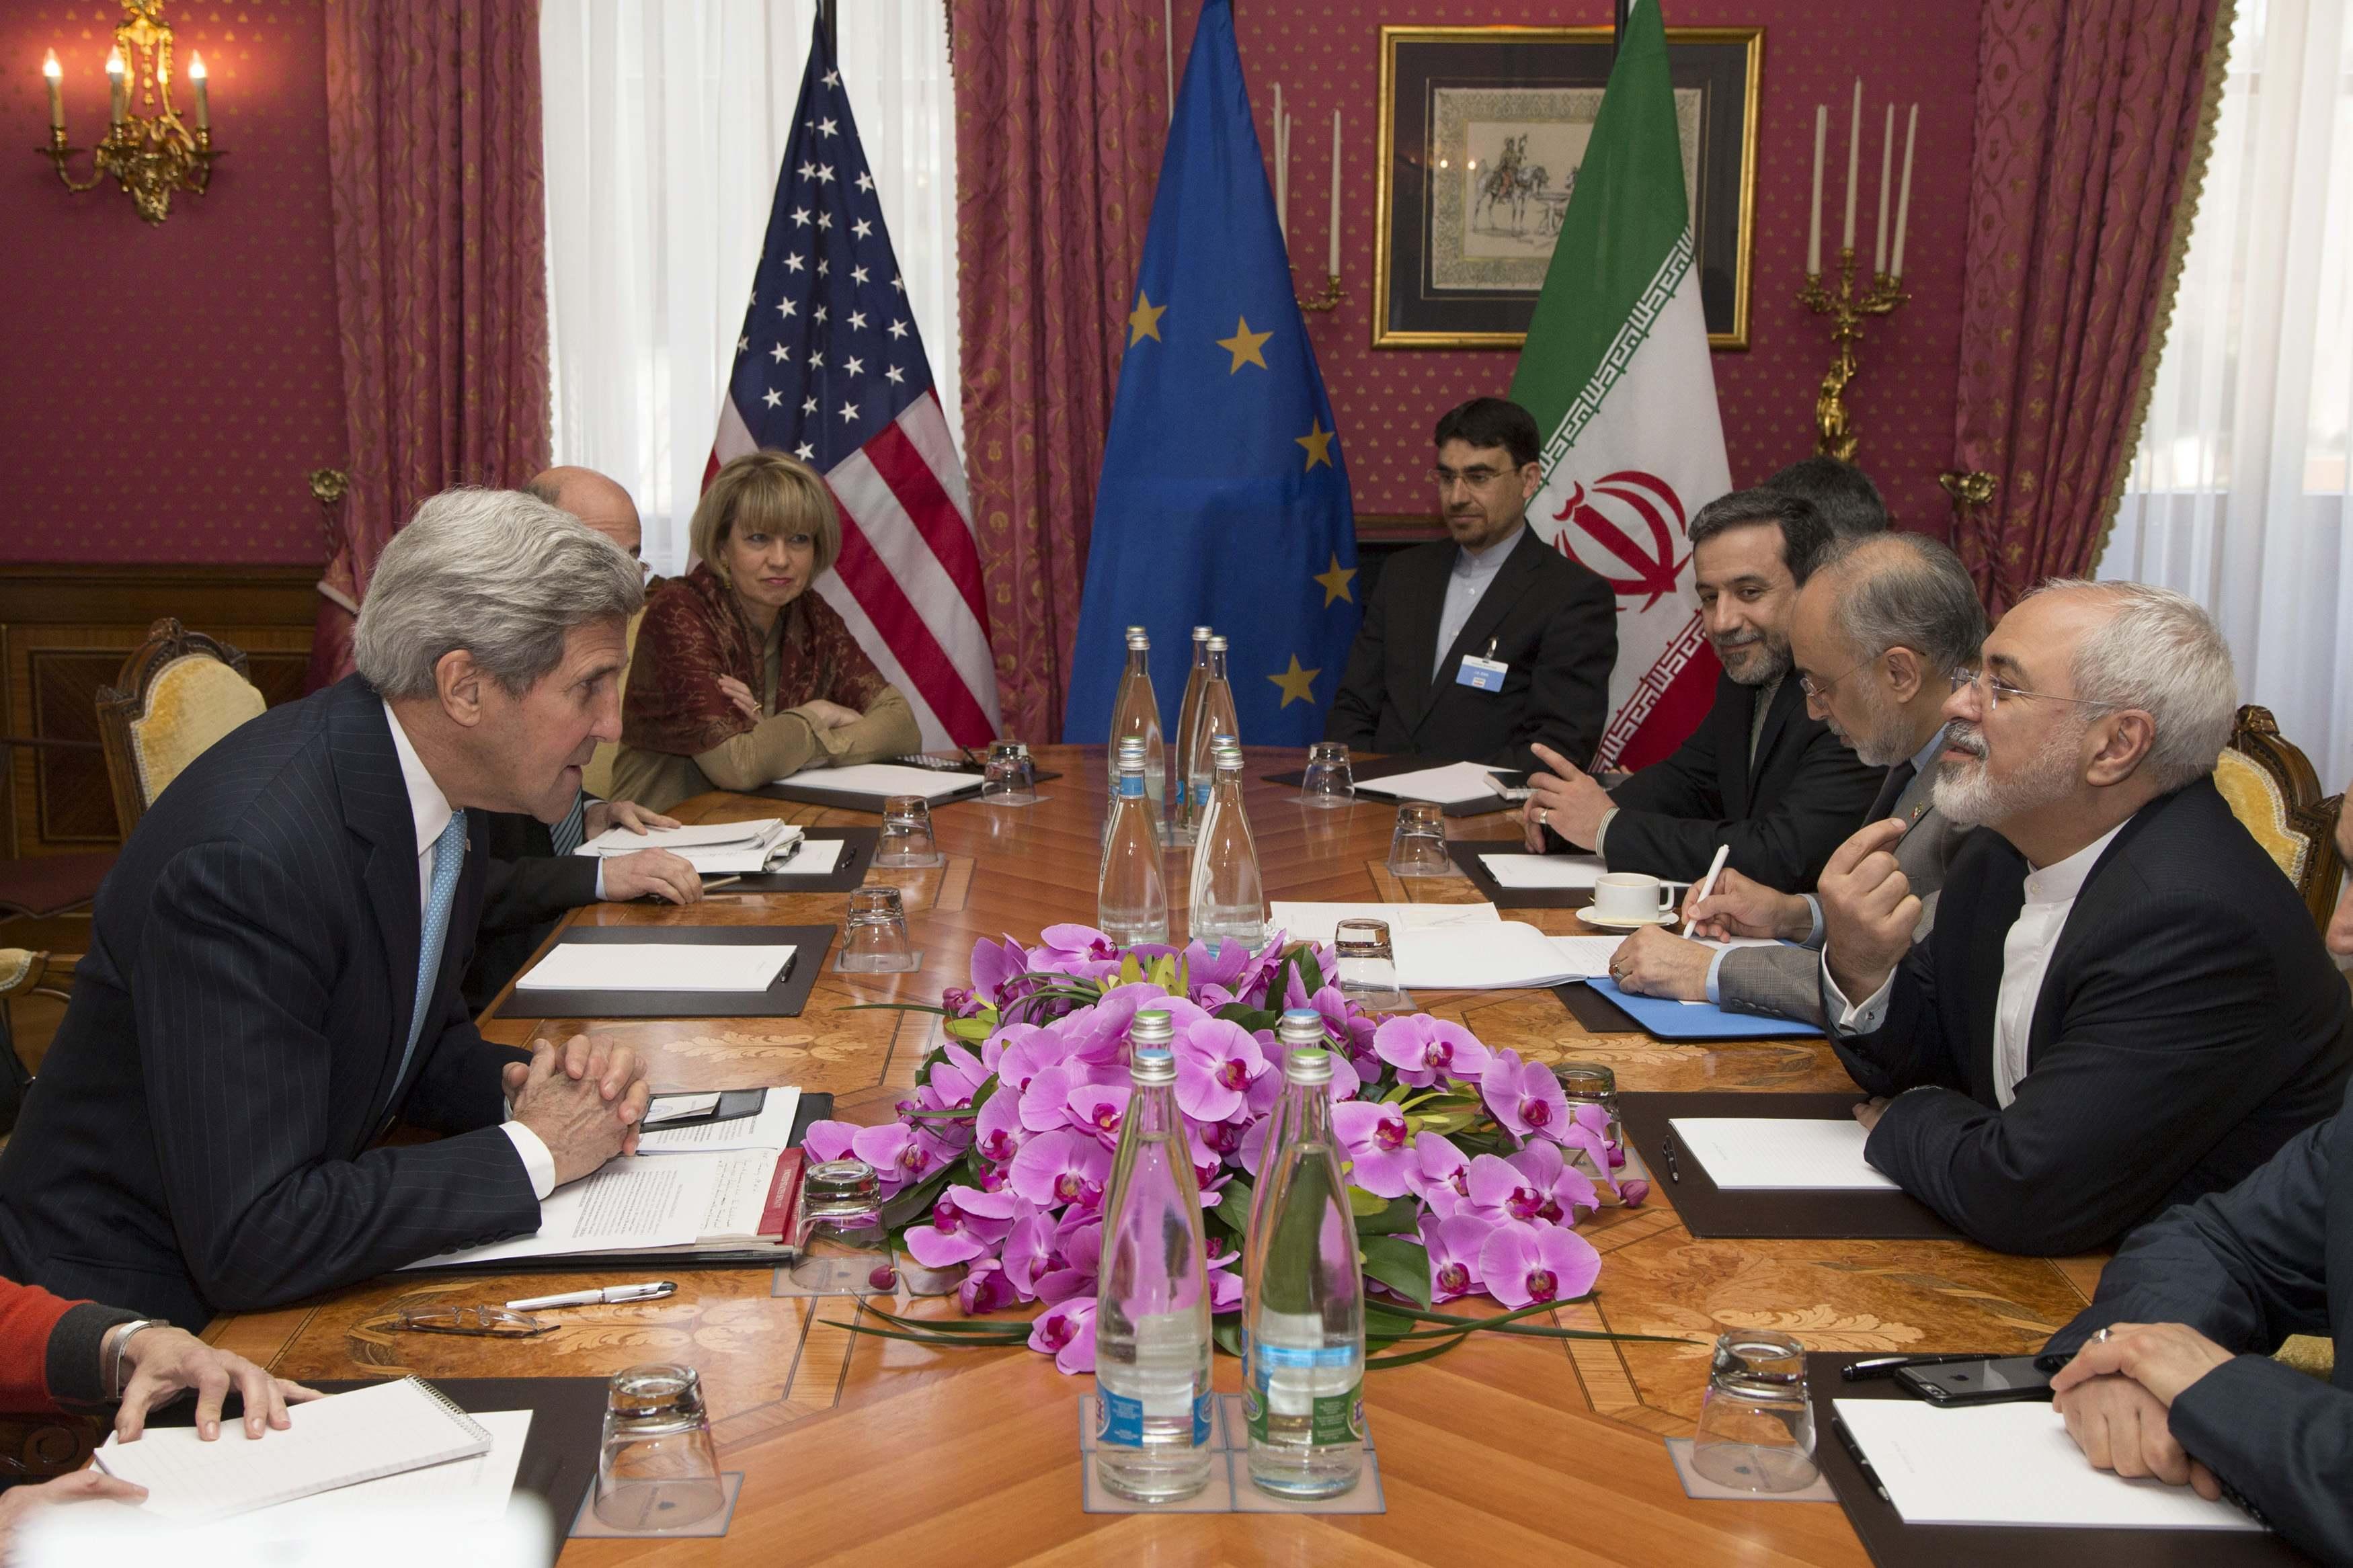 Iran Backs Away From Key Detalj i Nuclear Deal.